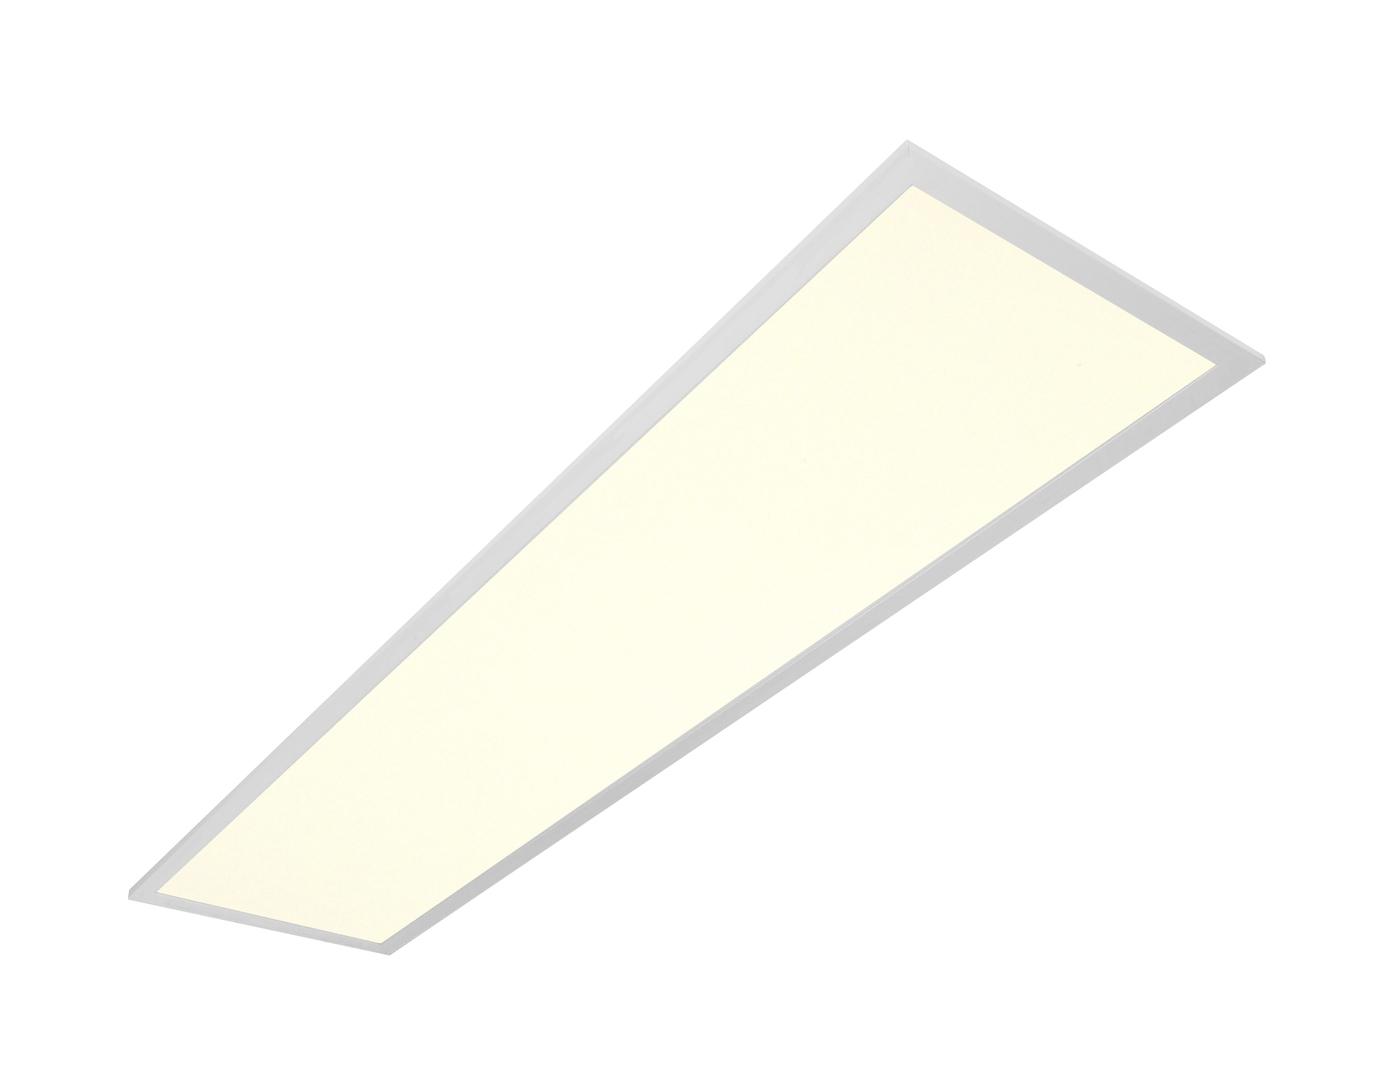 Panou LED dreptunghi alb 60W 230V IP20 4000K